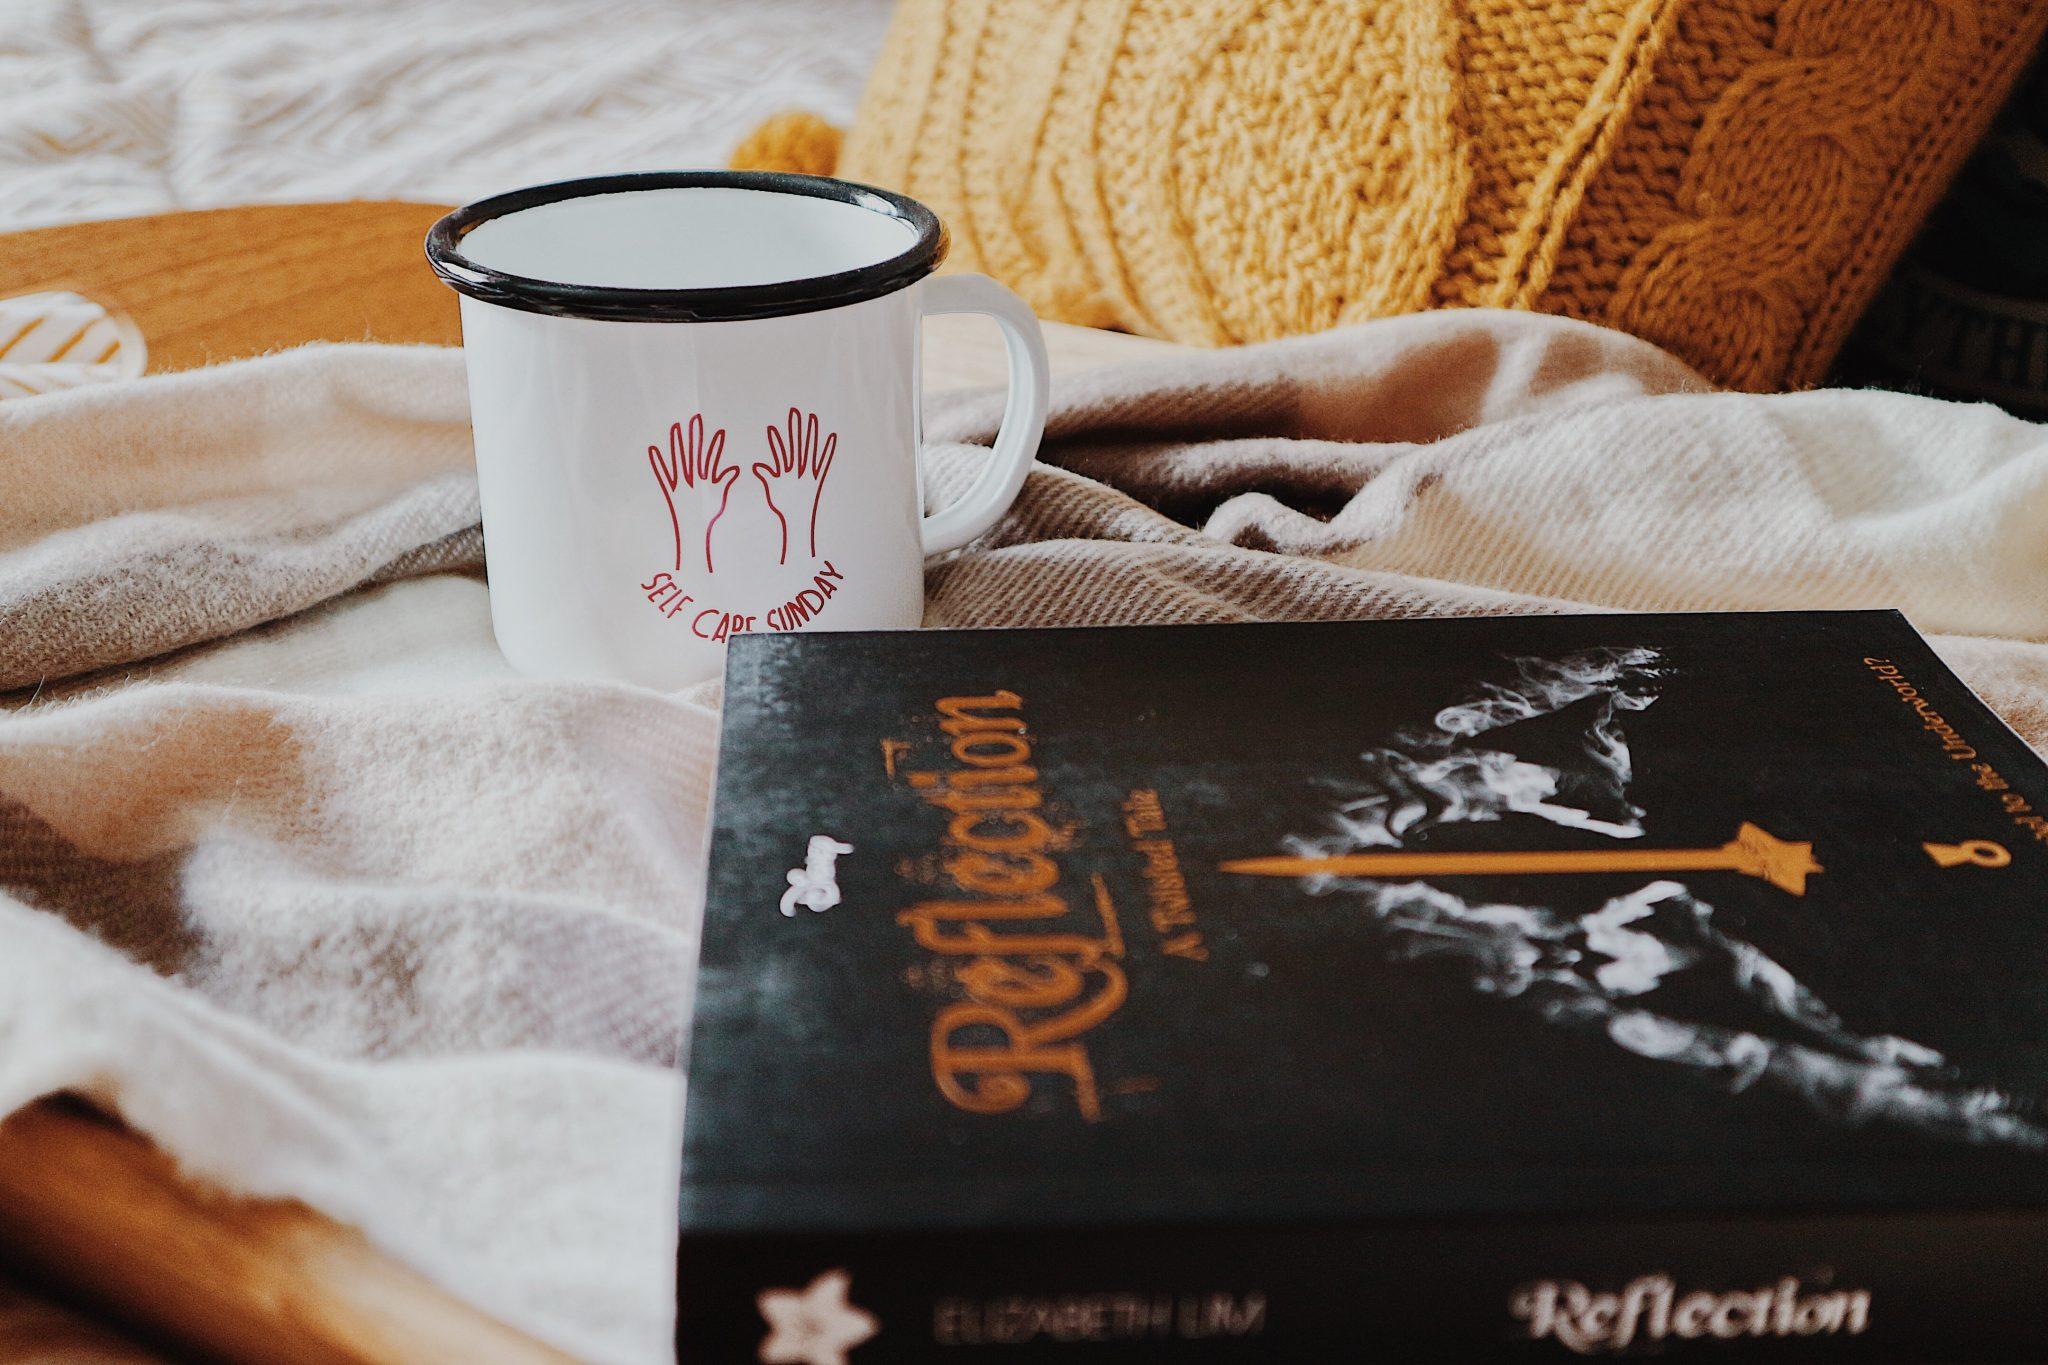 Self Care Sunday Mug + Twisted Tale: Reflection Book